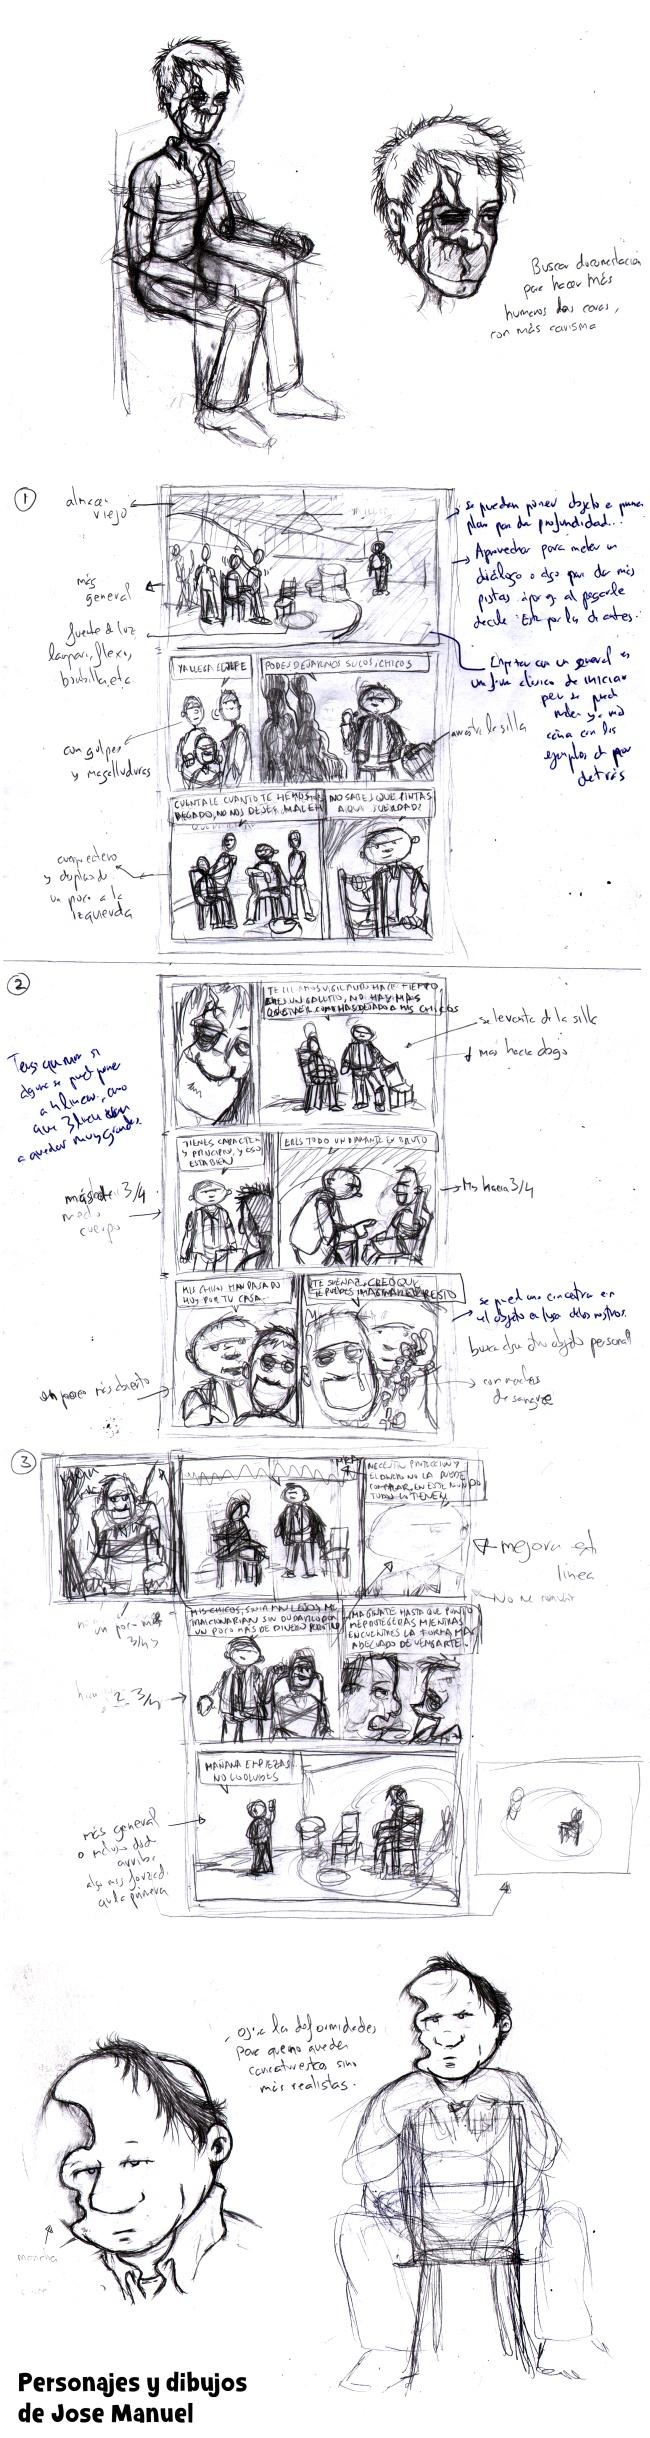 planificacion-pagina-comic-alumnos-academiac10-alvaro-muñoz